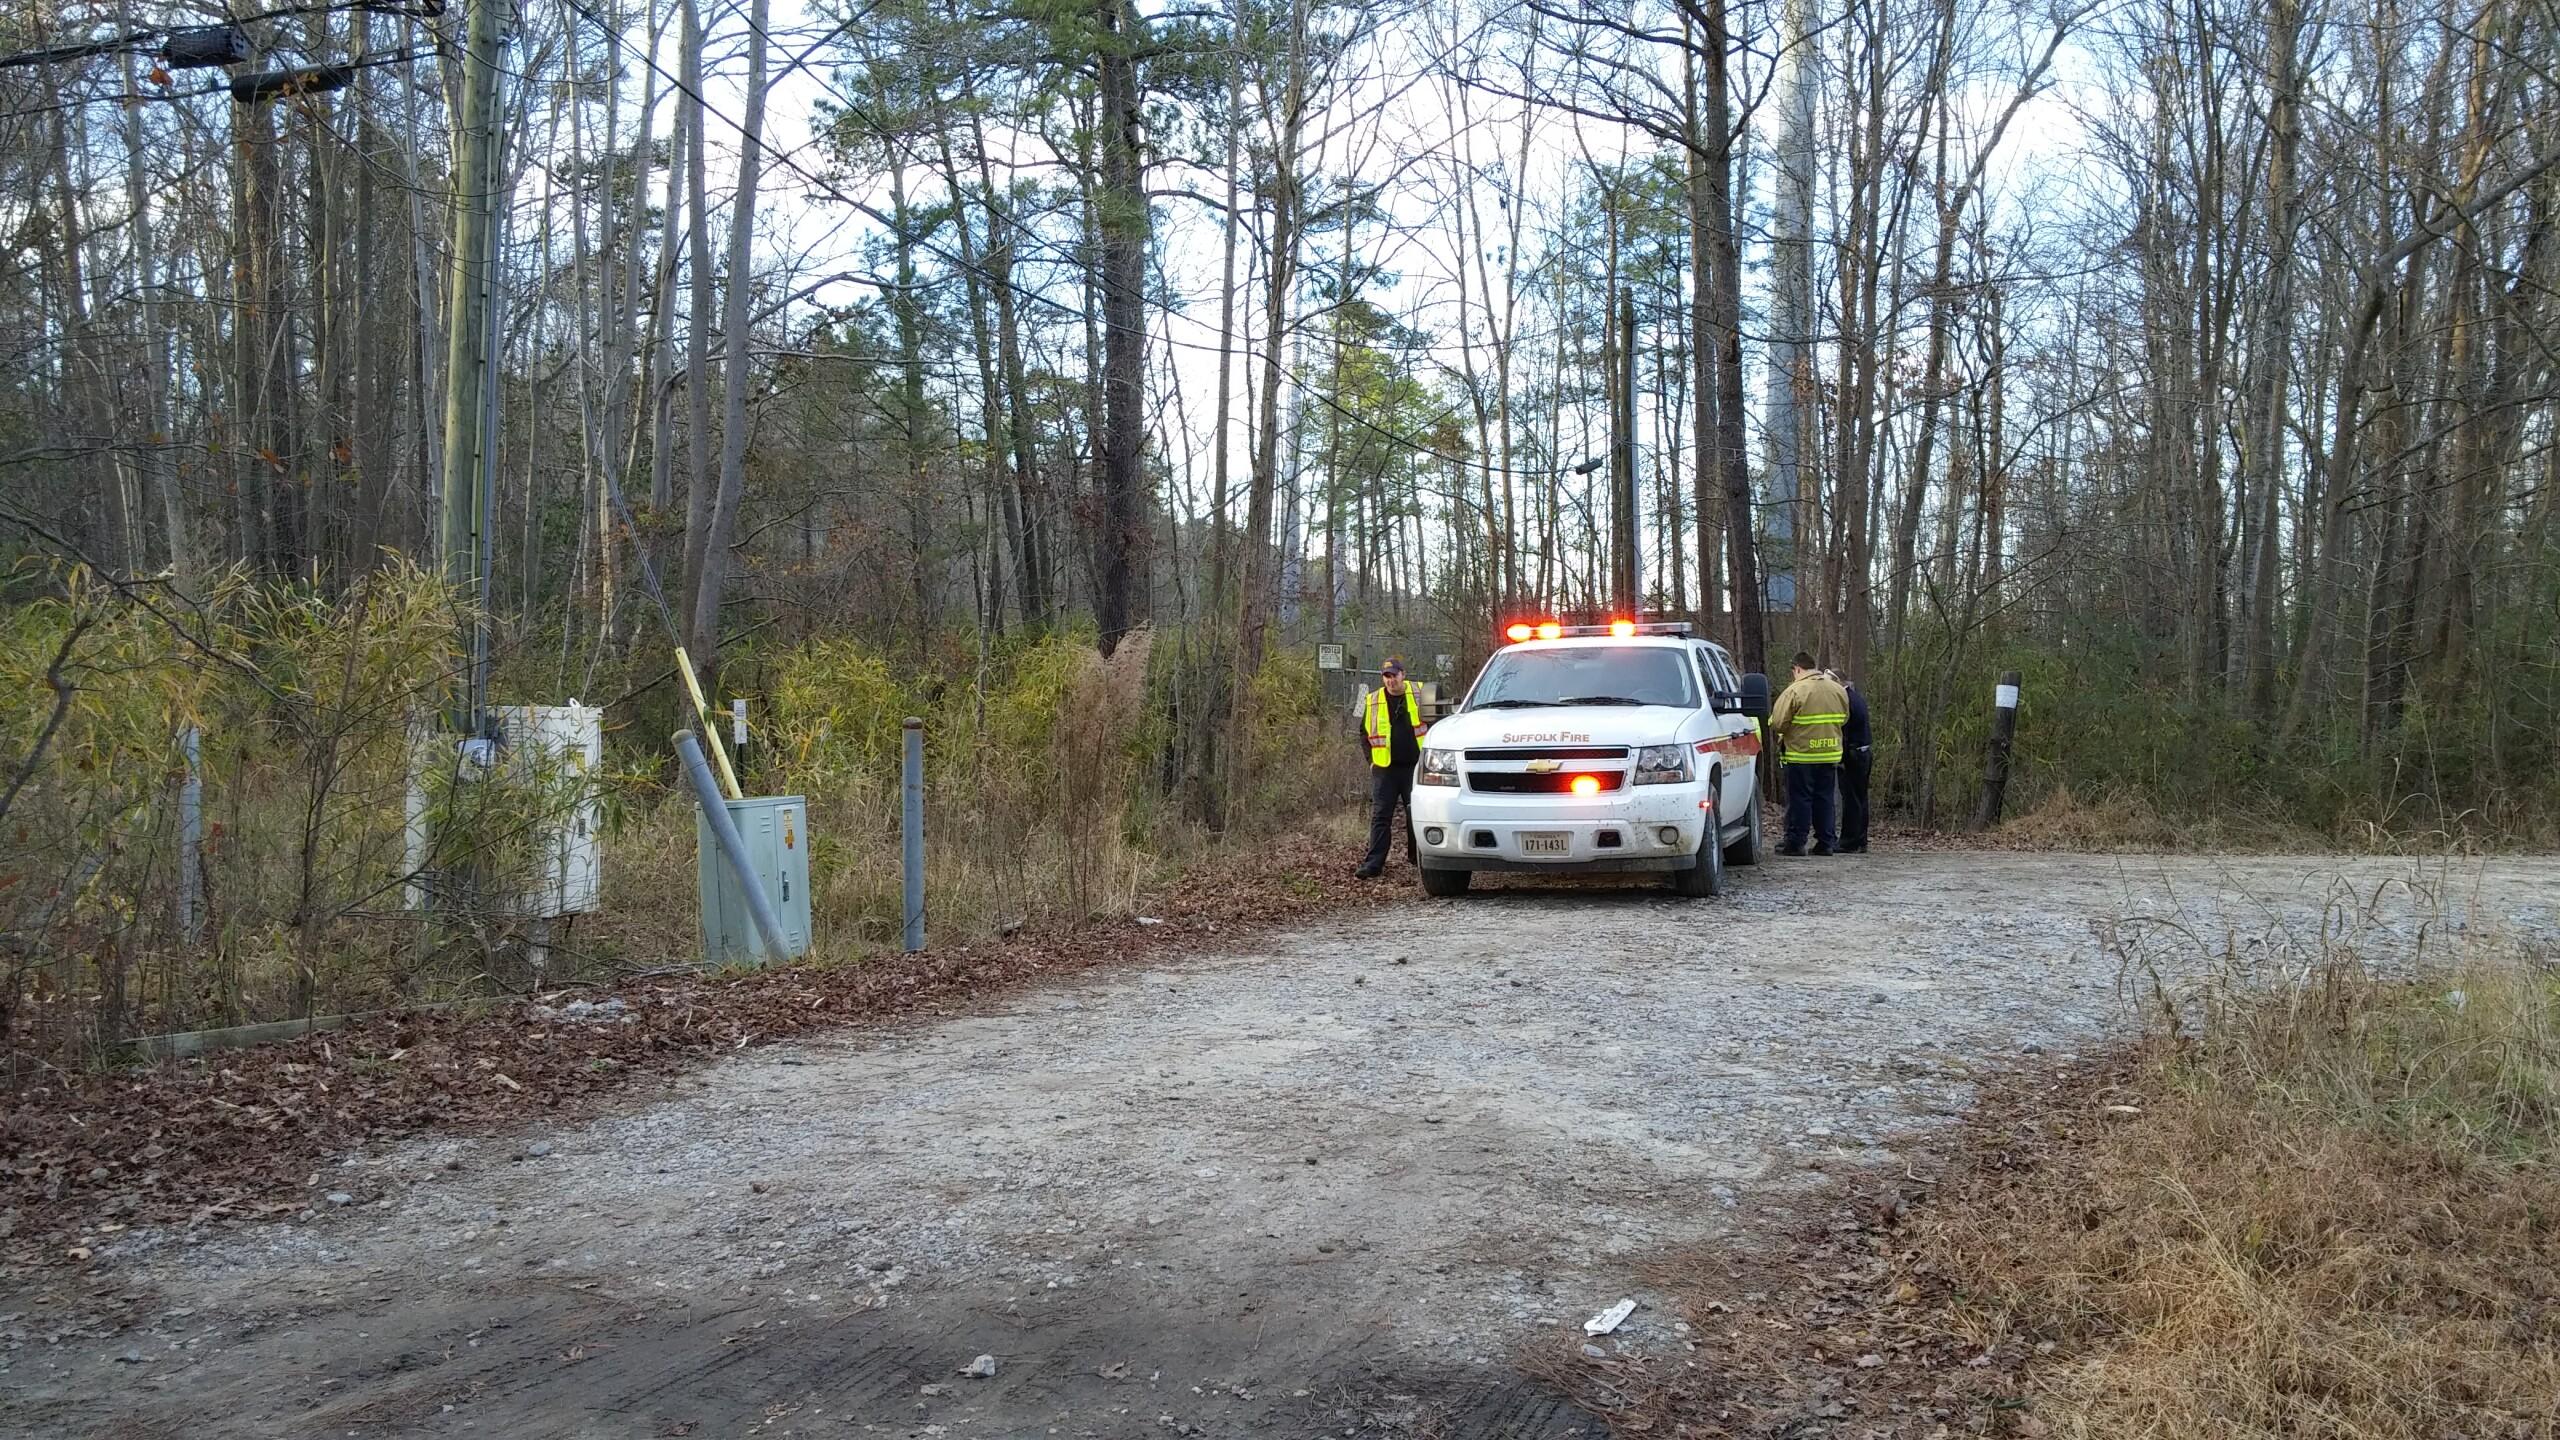 Photos: UPDATE: Plane on training flight crashes into swamp near Hampton Roads ExecutiveAirport